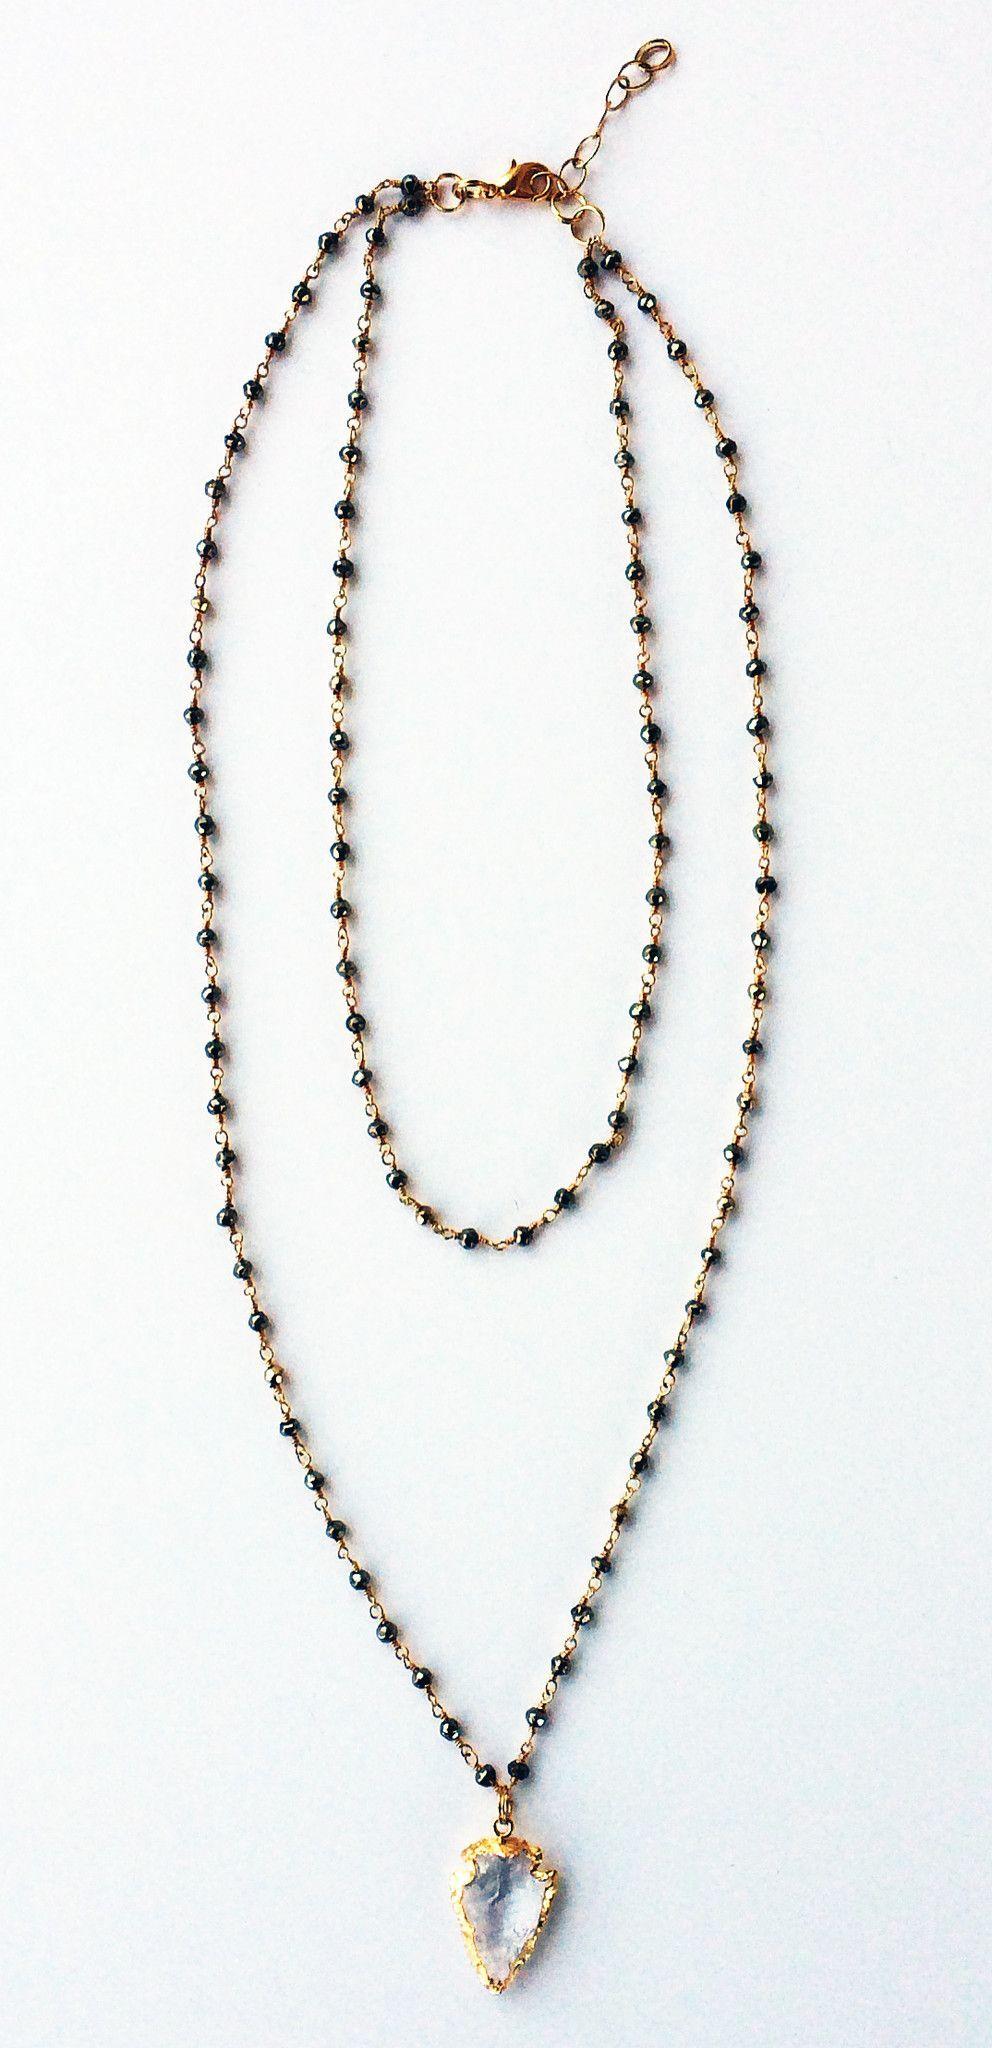 63a94b261 Pin de Trang Nguyen en Jewels